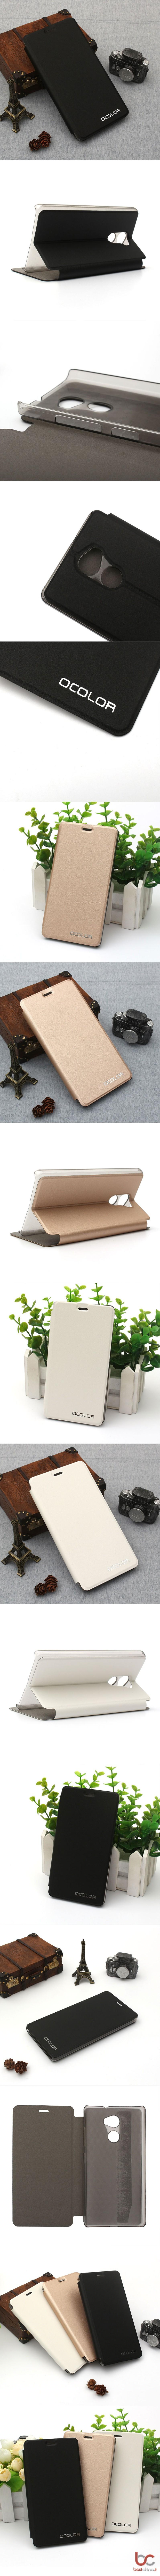 elephone-c1-flip-cover-1